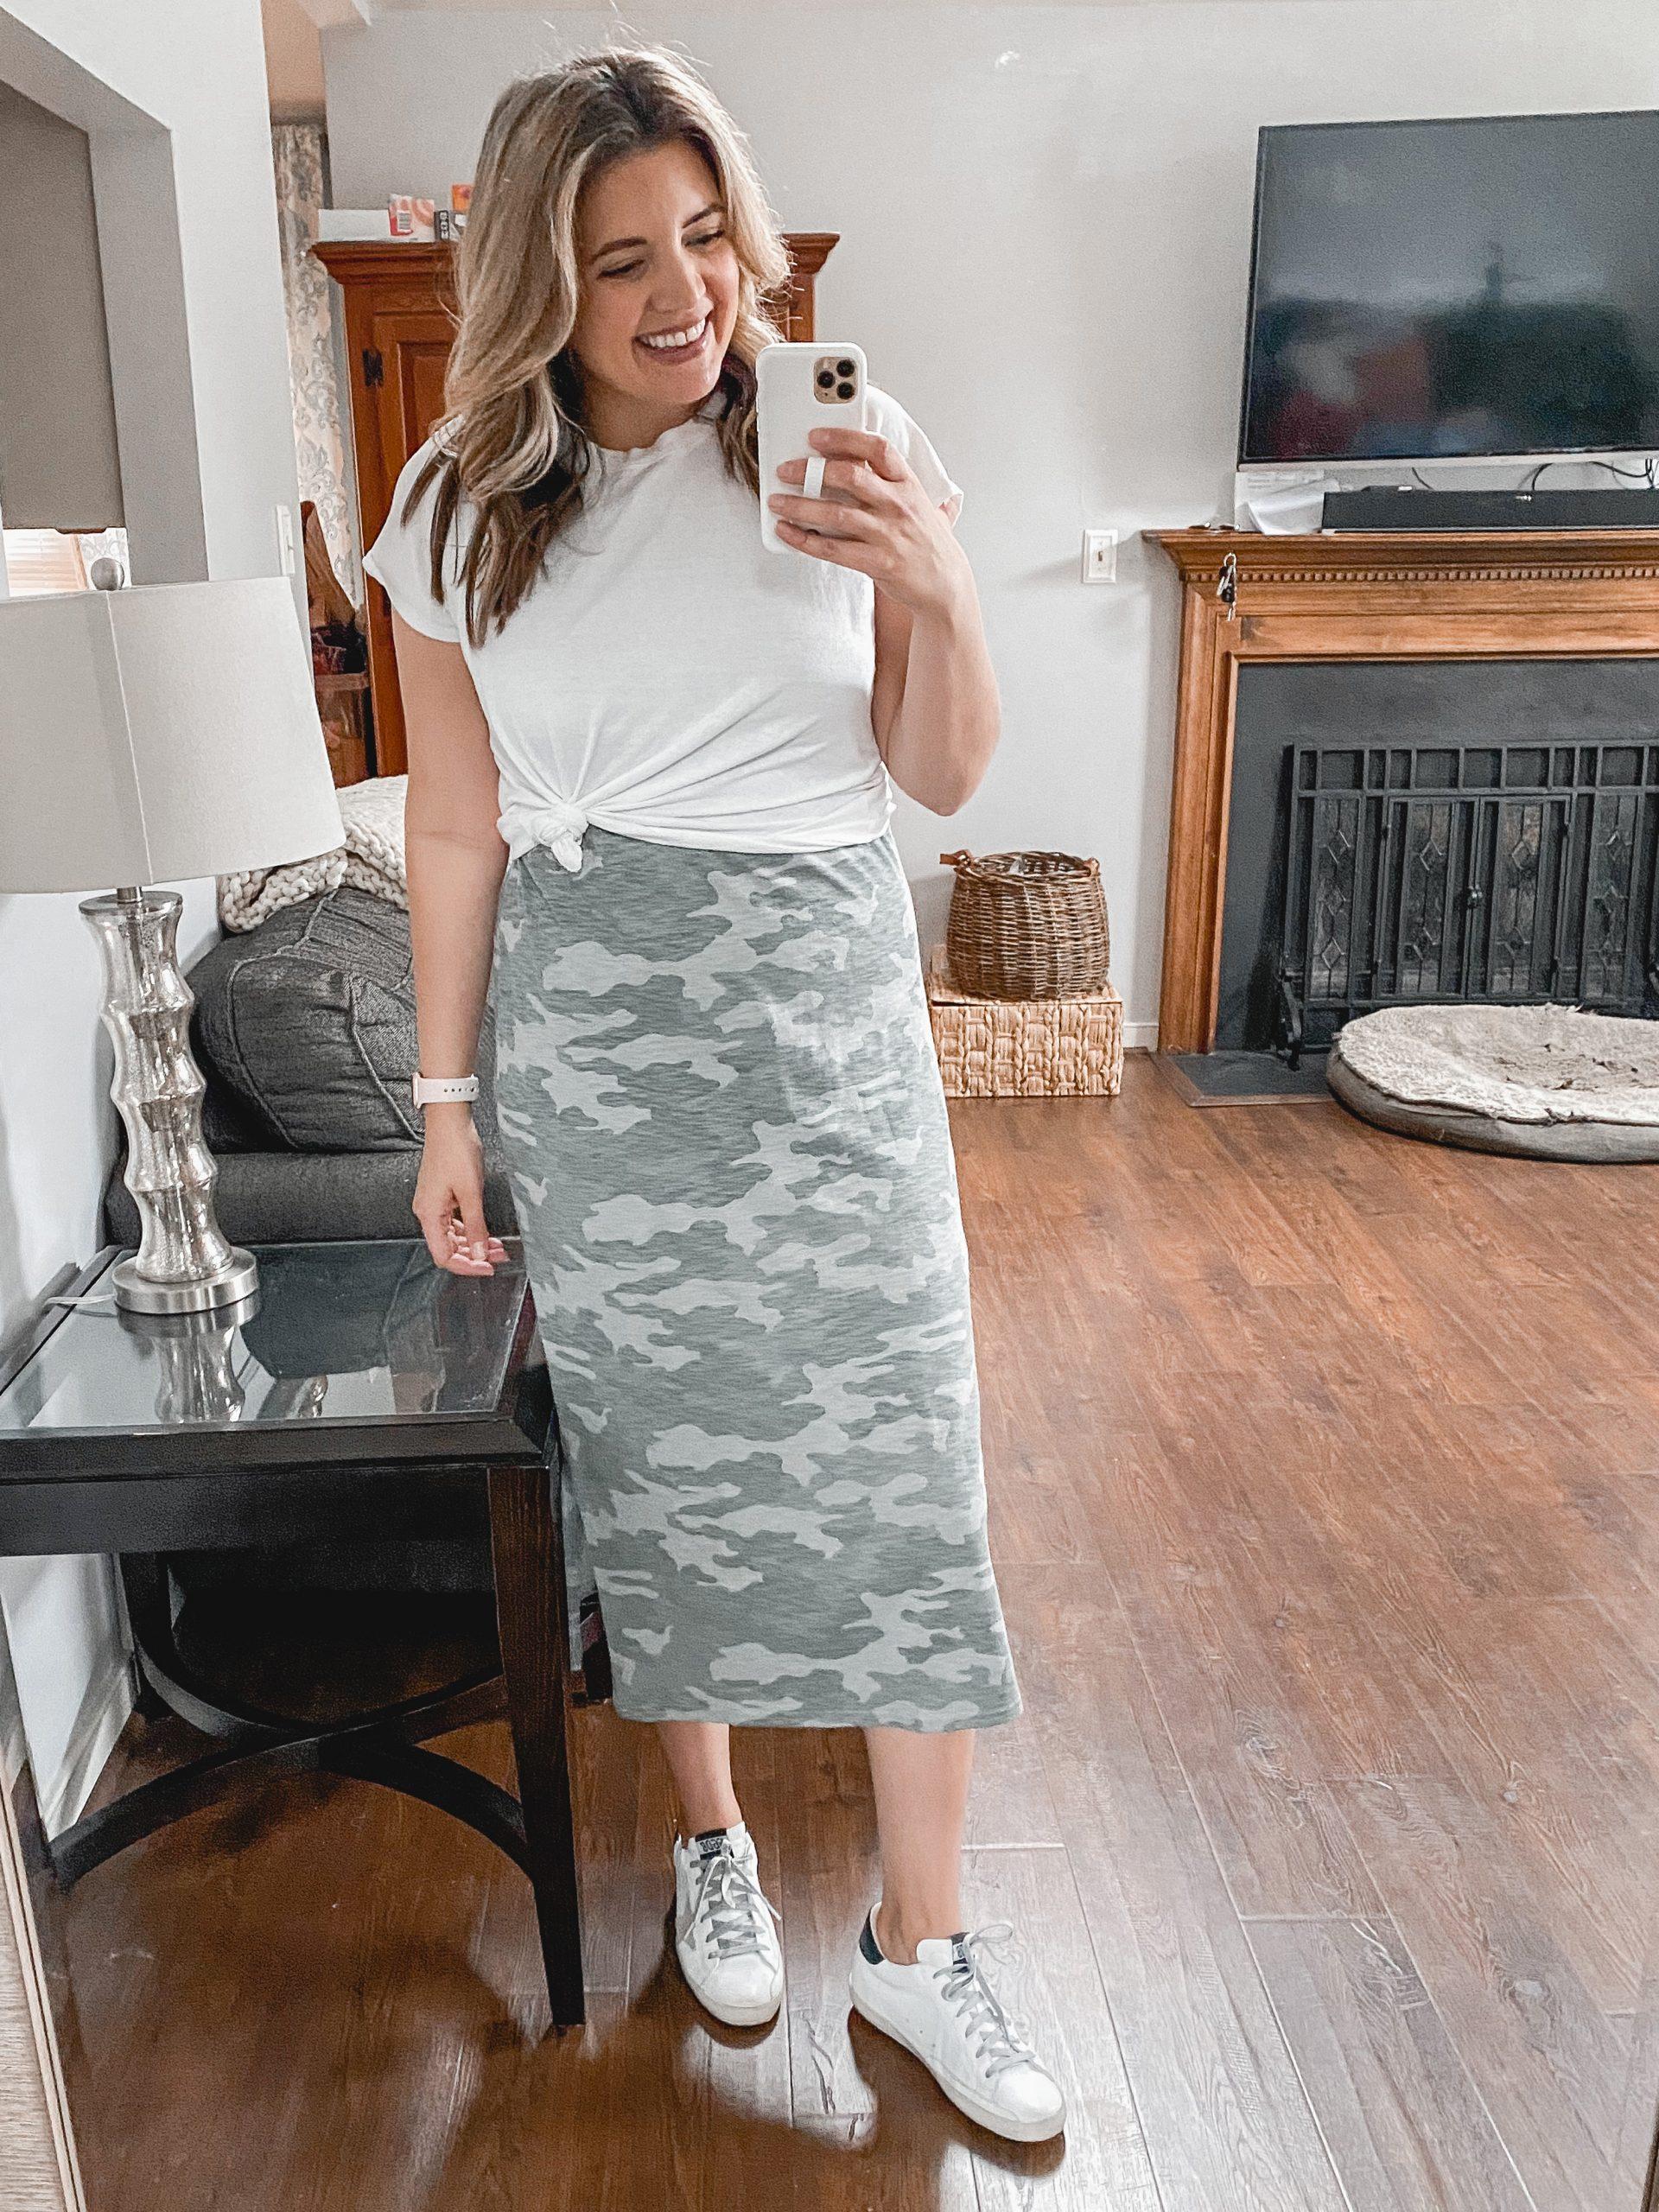 Virginia blogger, Lauren Dix, shares four tshirt dress outfit formulas for tee dresses mini to maxi length!